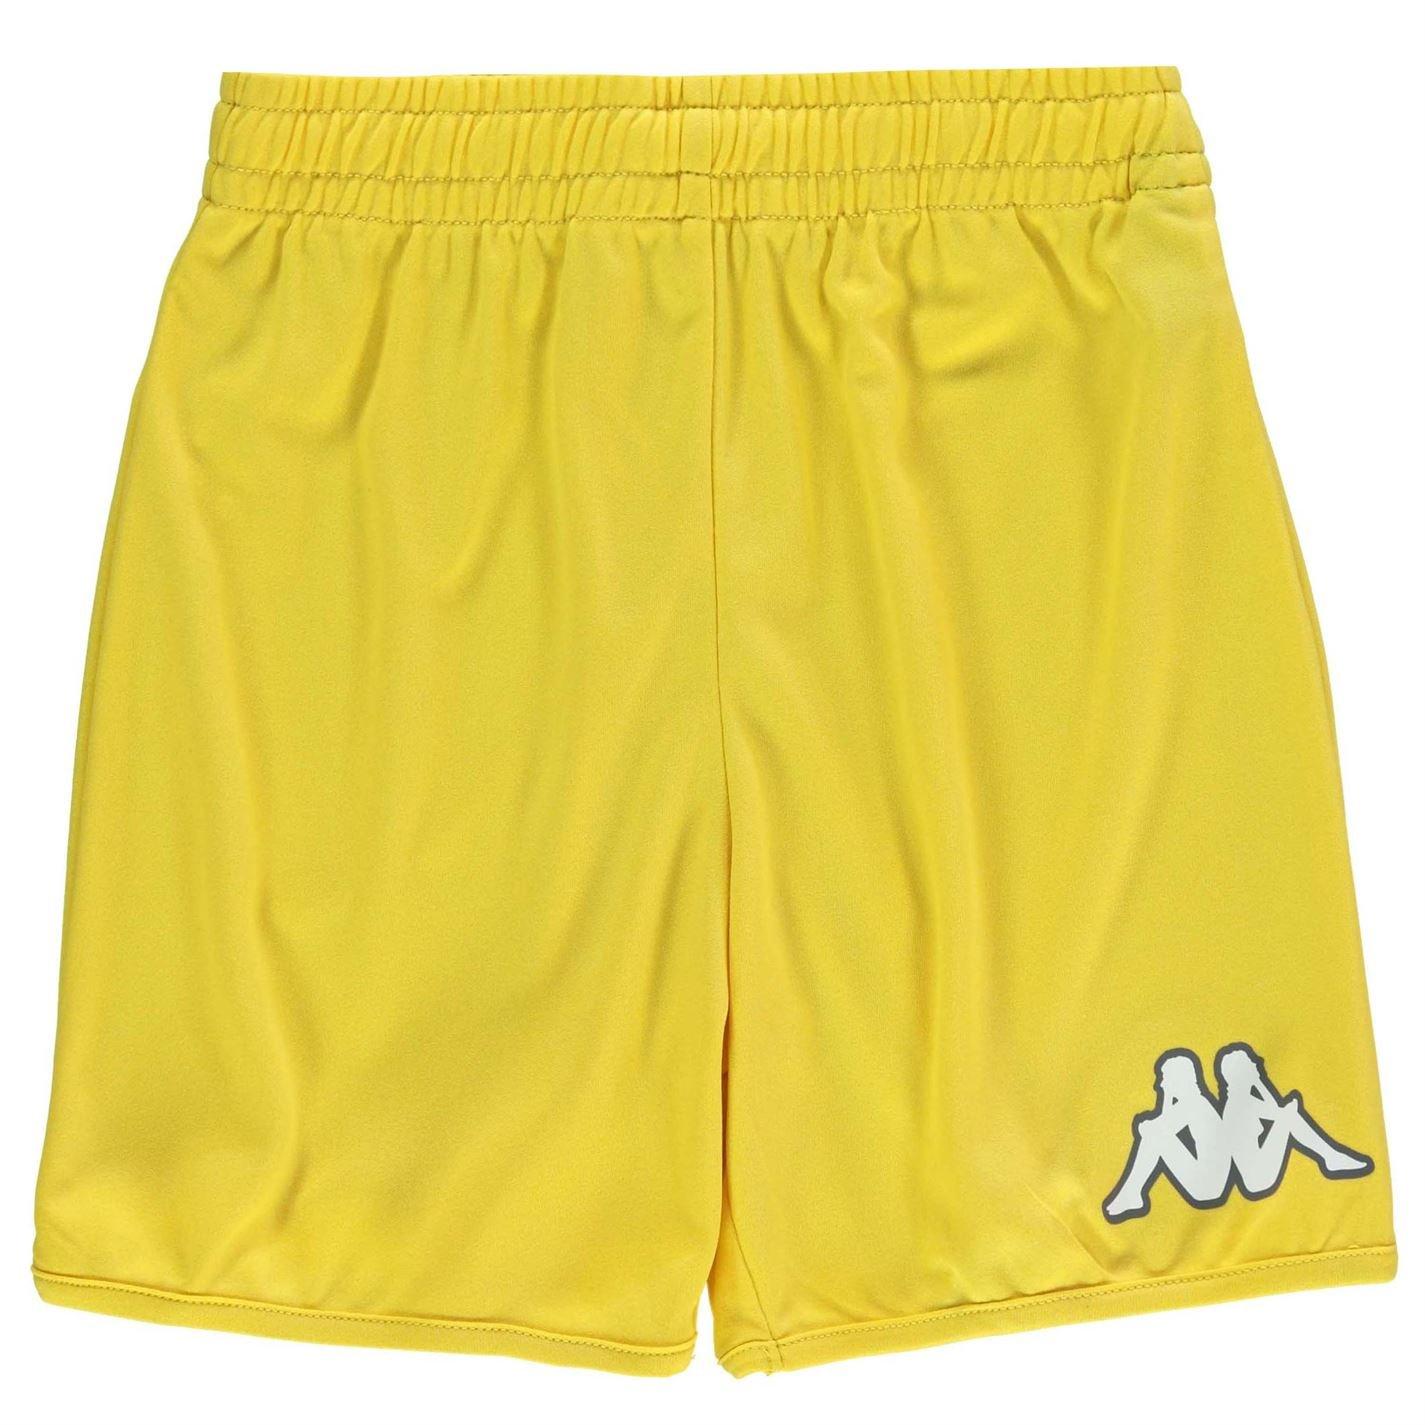 Kappa Kids Lugo Shorts Pants Bottoms Boys Tie Fastenings